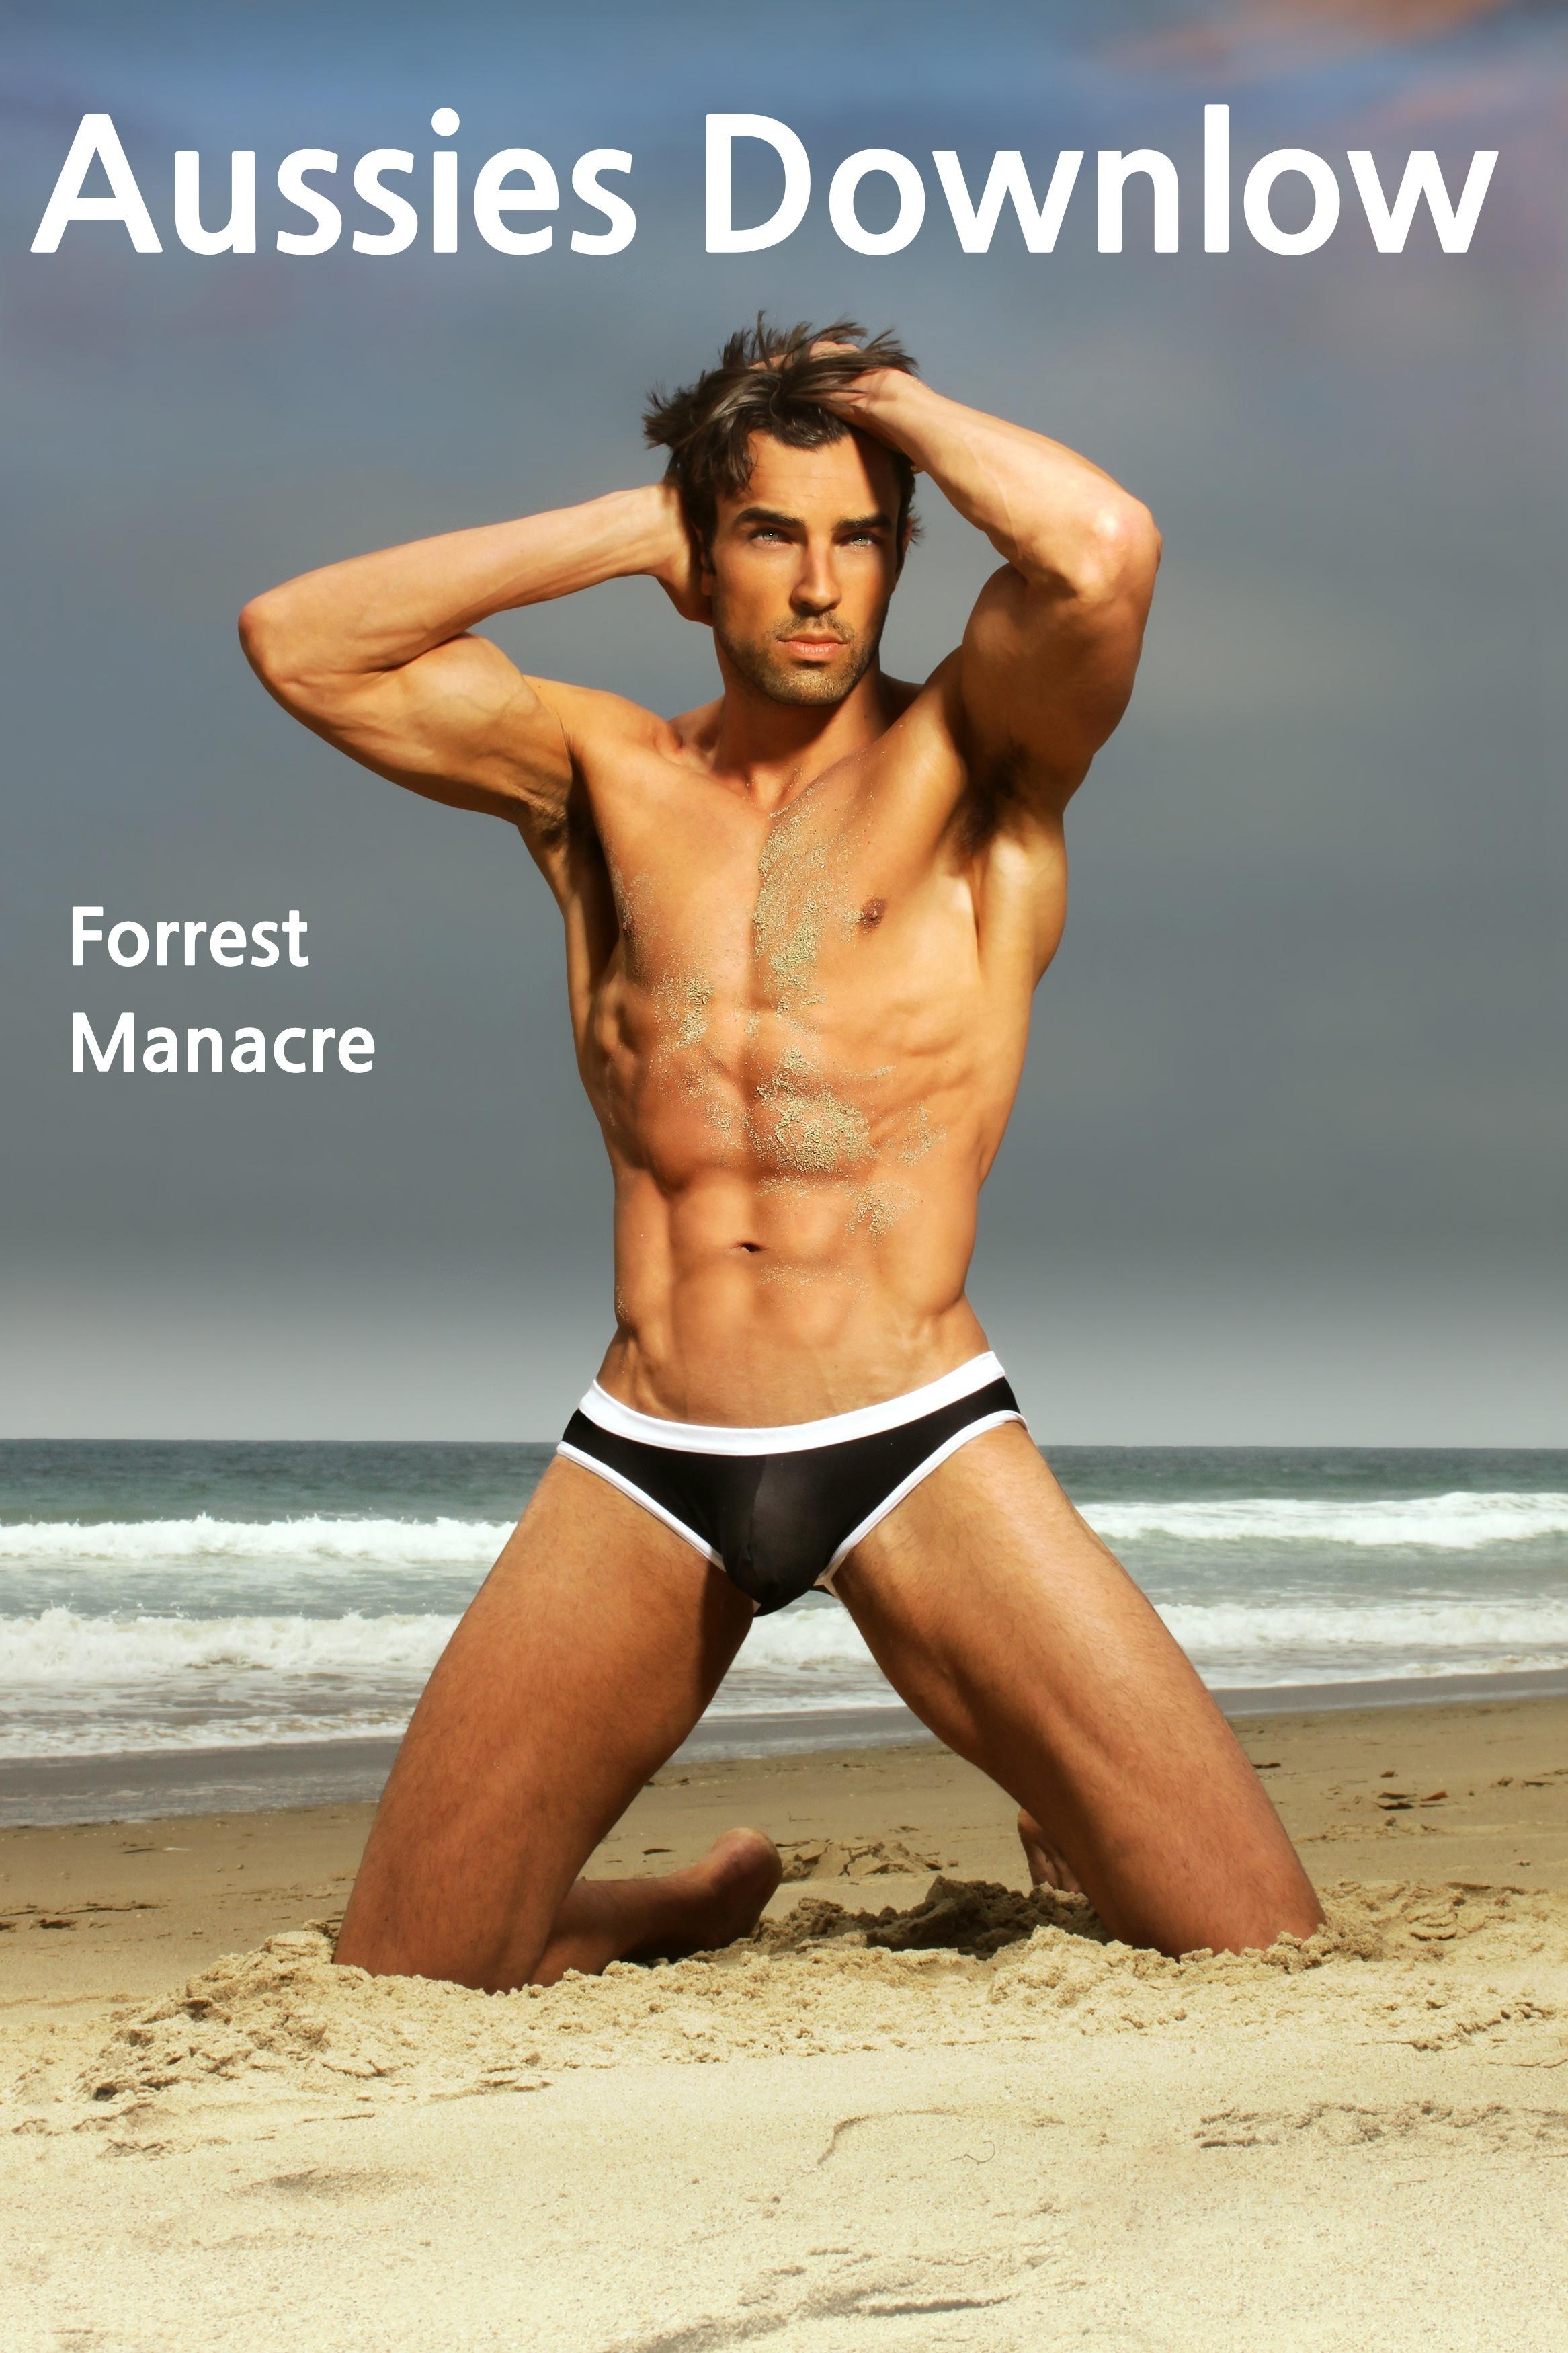 Aussies Downlow Forrest Manacre